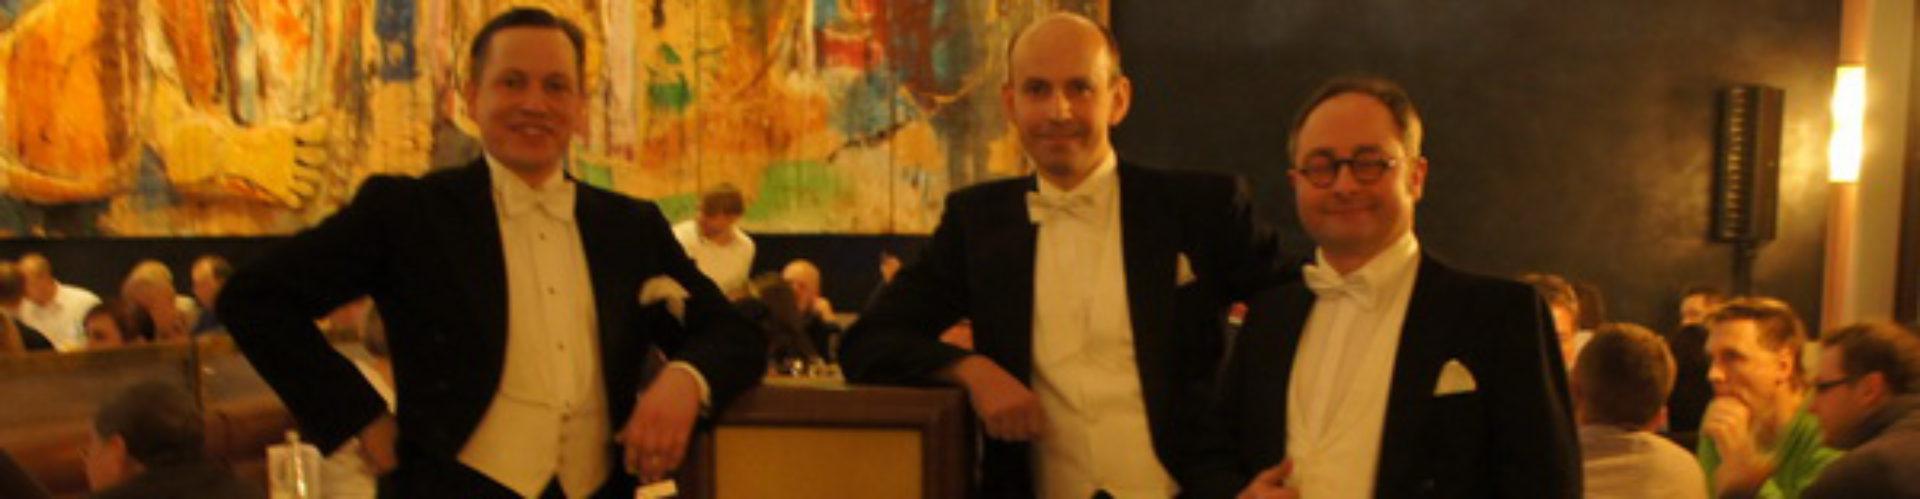 Partybands Violinenqaaurtetts showprogramm LED Shows Akrobatik Berlin